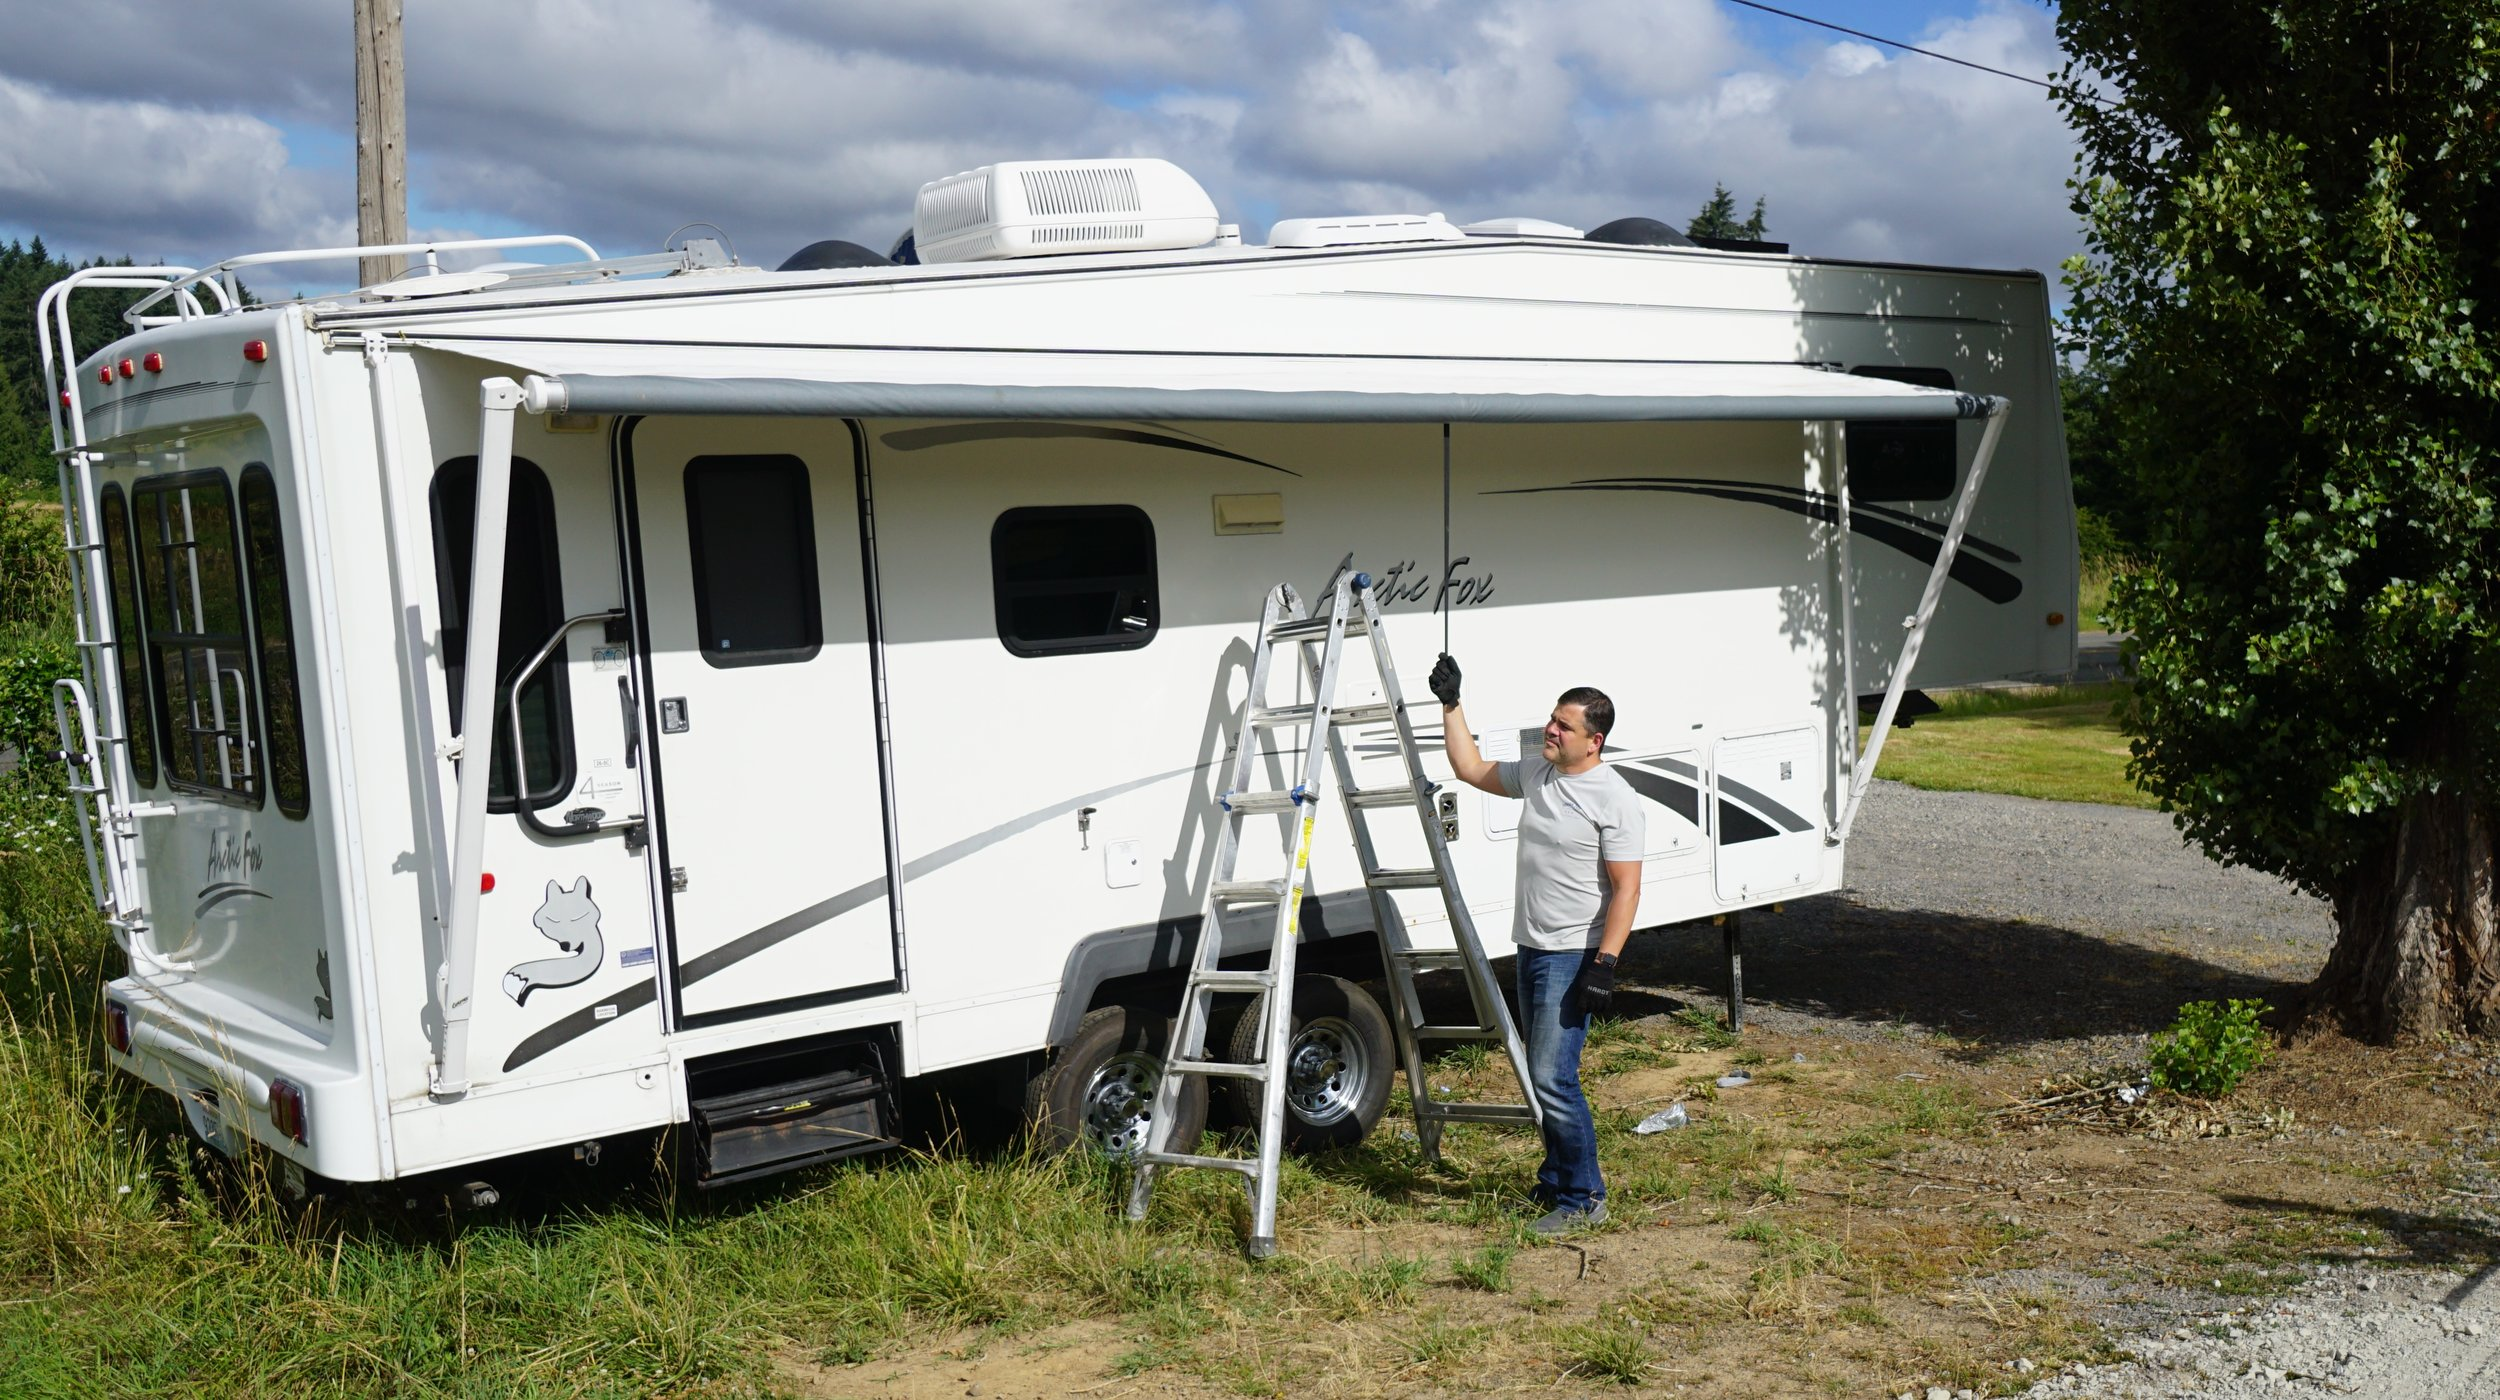 Tyler Hammack is the owner of Tough Top Awnings in Brush Prairie, along with Christie Hammack. Courtesy of Viki Eierdam